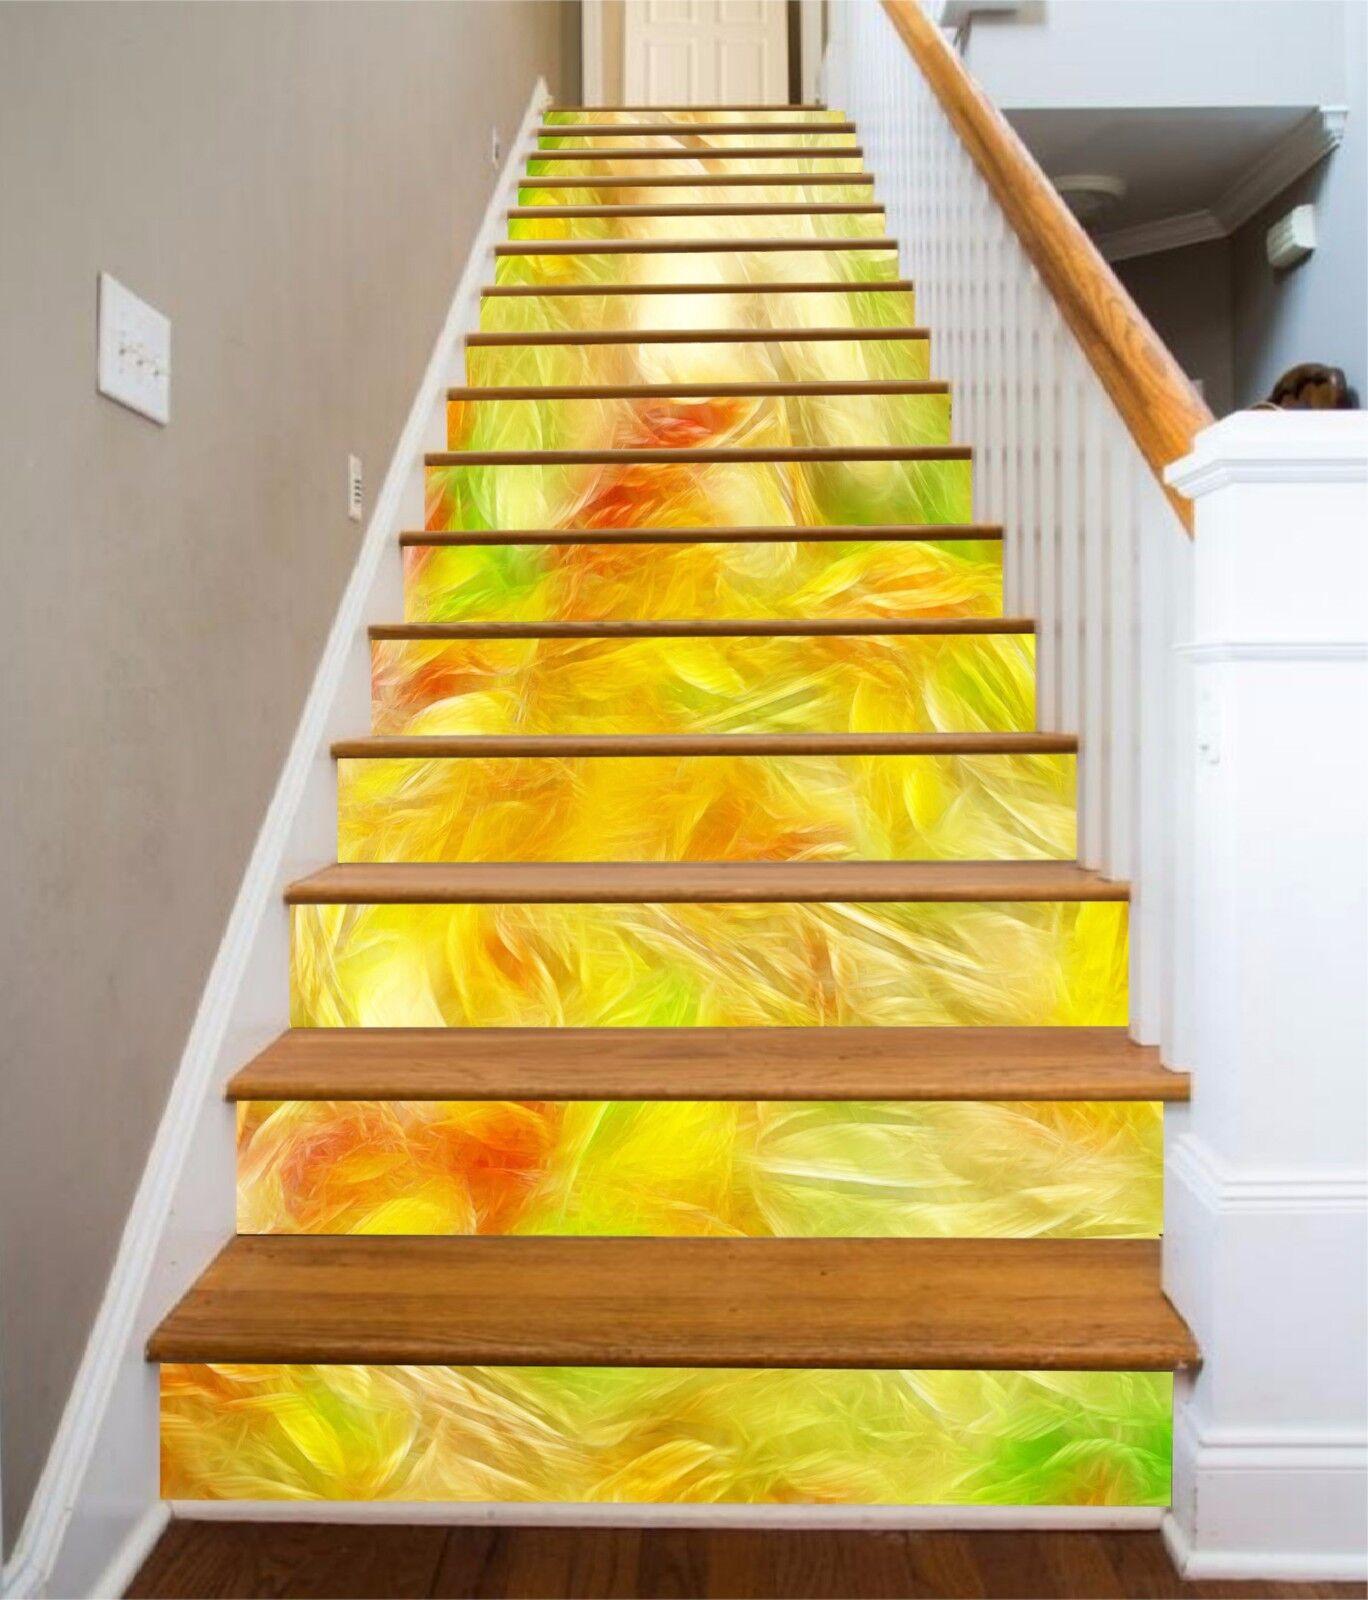 3D Gelb texture Stair Risers Decoration Photo Mural Vinyl Decal WandPapier AU